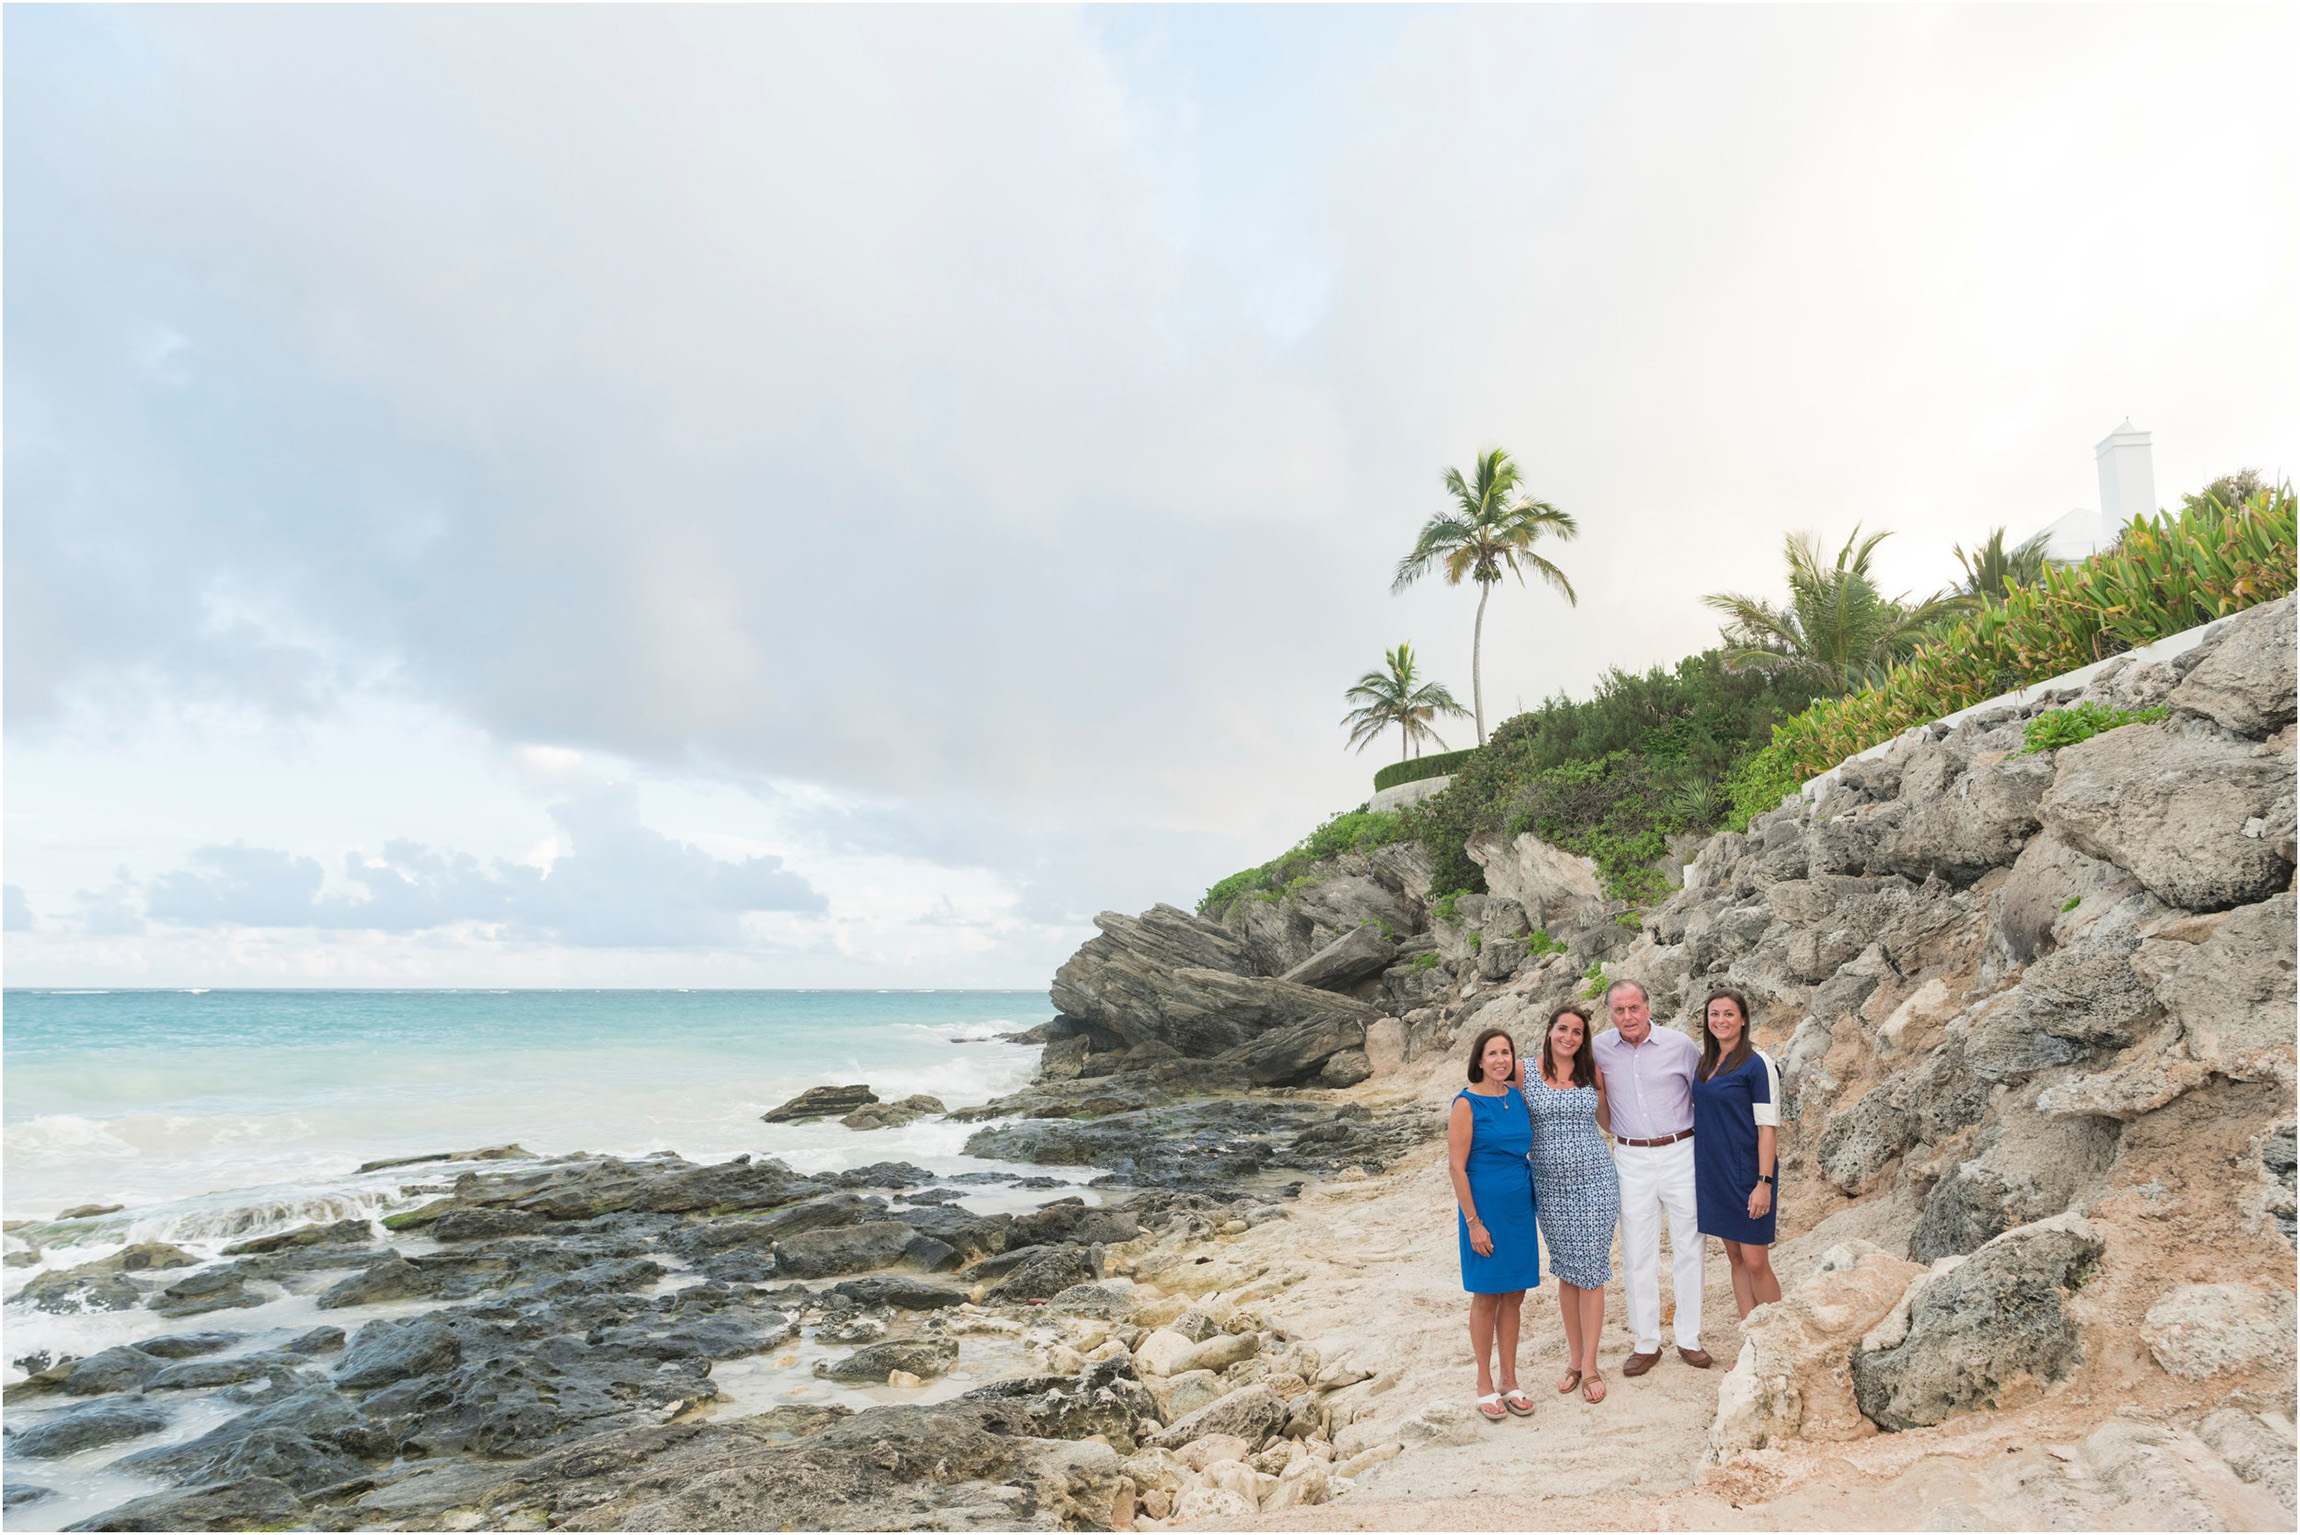 ©FianderFoto_Bermuda Photographer_Grape Bay_Family_Dughi_017.jpg